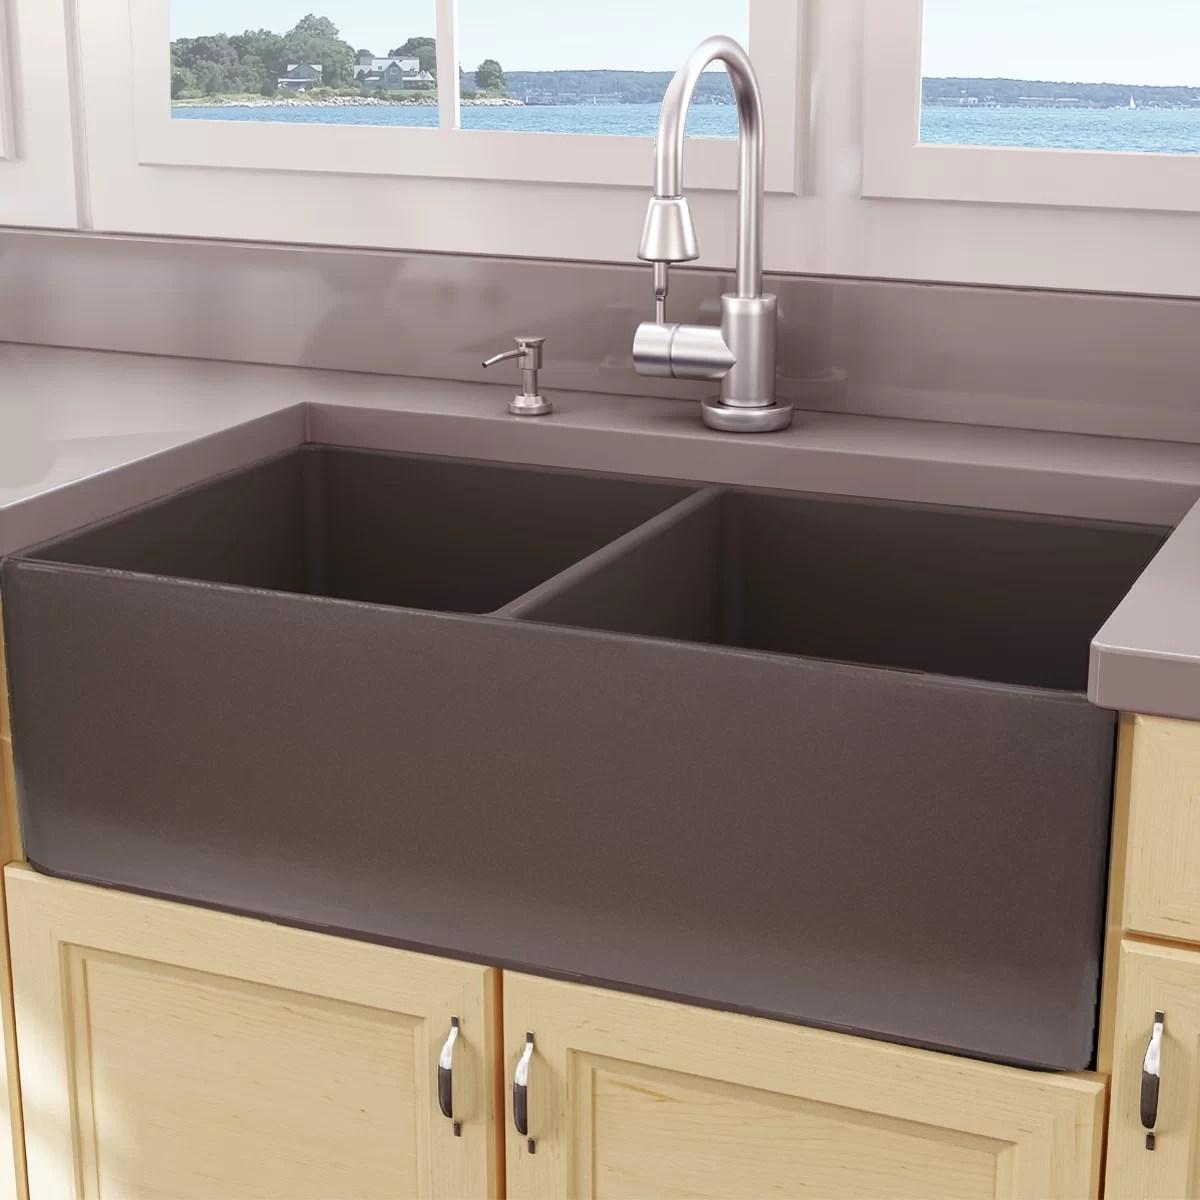 nantucket sinks cape 33 x 15 double bowl farmhouse on kitchens with farmhouse sinks id=80457